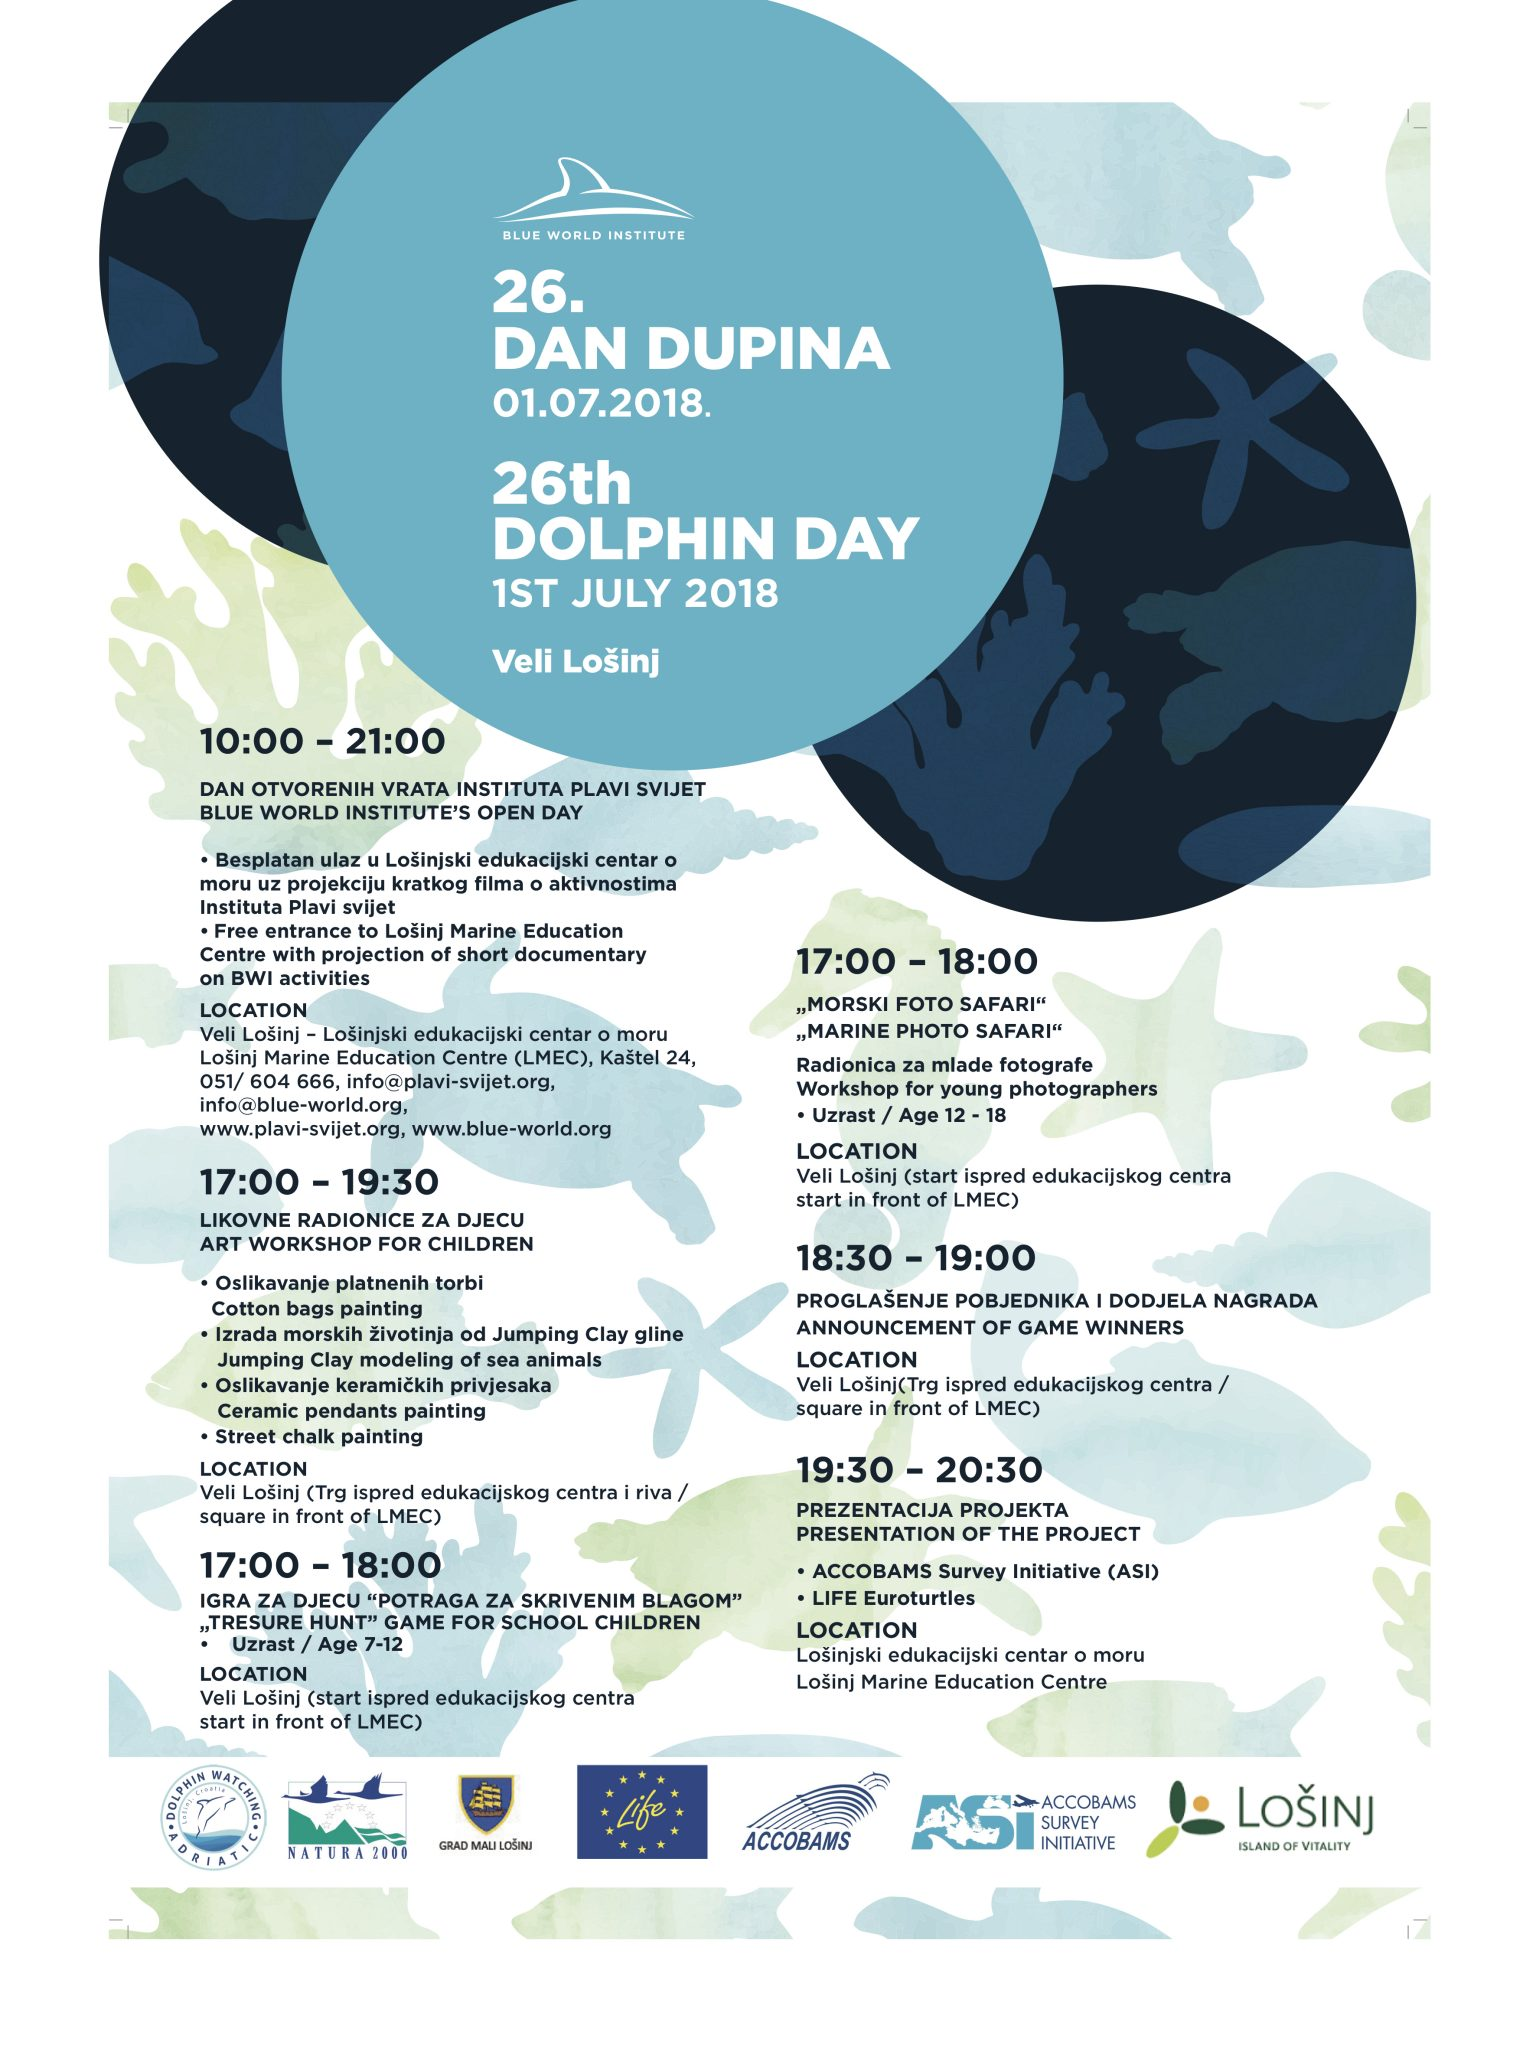 26th Dolphin Day in Veli Lošinj | Blue World Institute